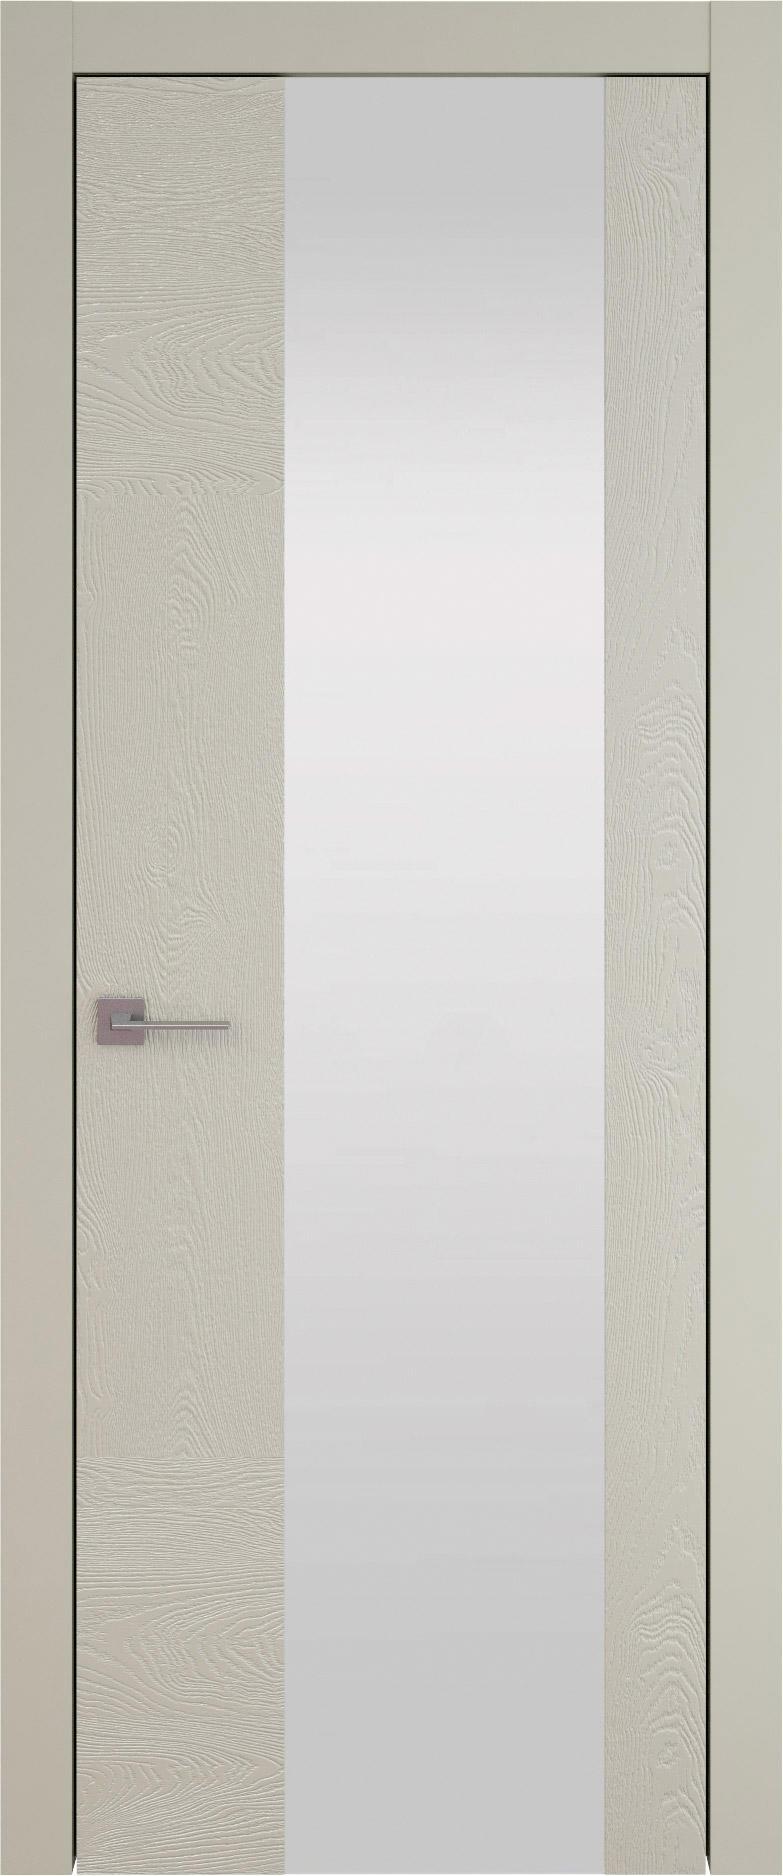 Tivoli Е-1 цвет - Серо-оливковая эмаль по шпону (RAL 7032) Со стеклом (ДО)